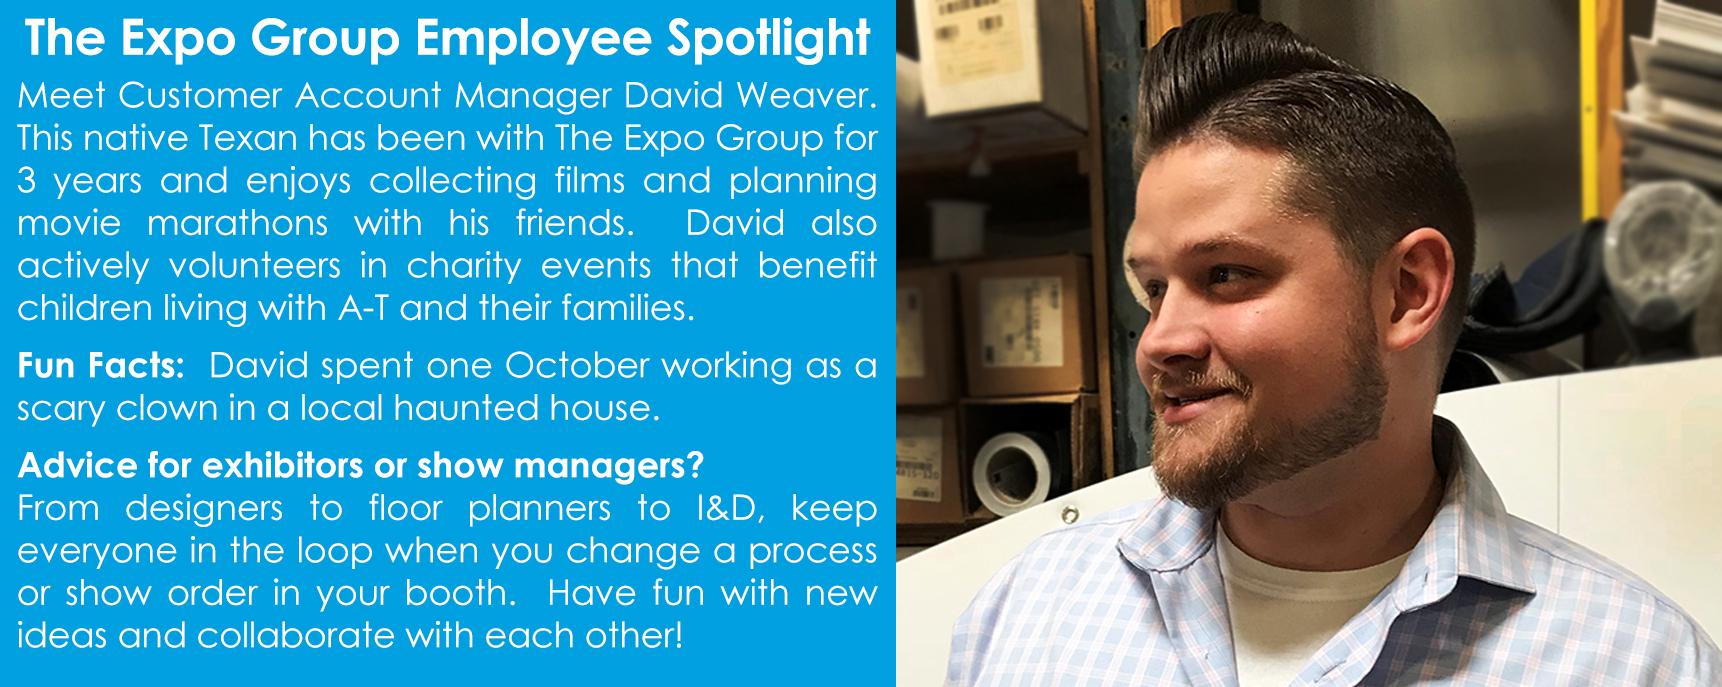 Employee Spotlight November 2018